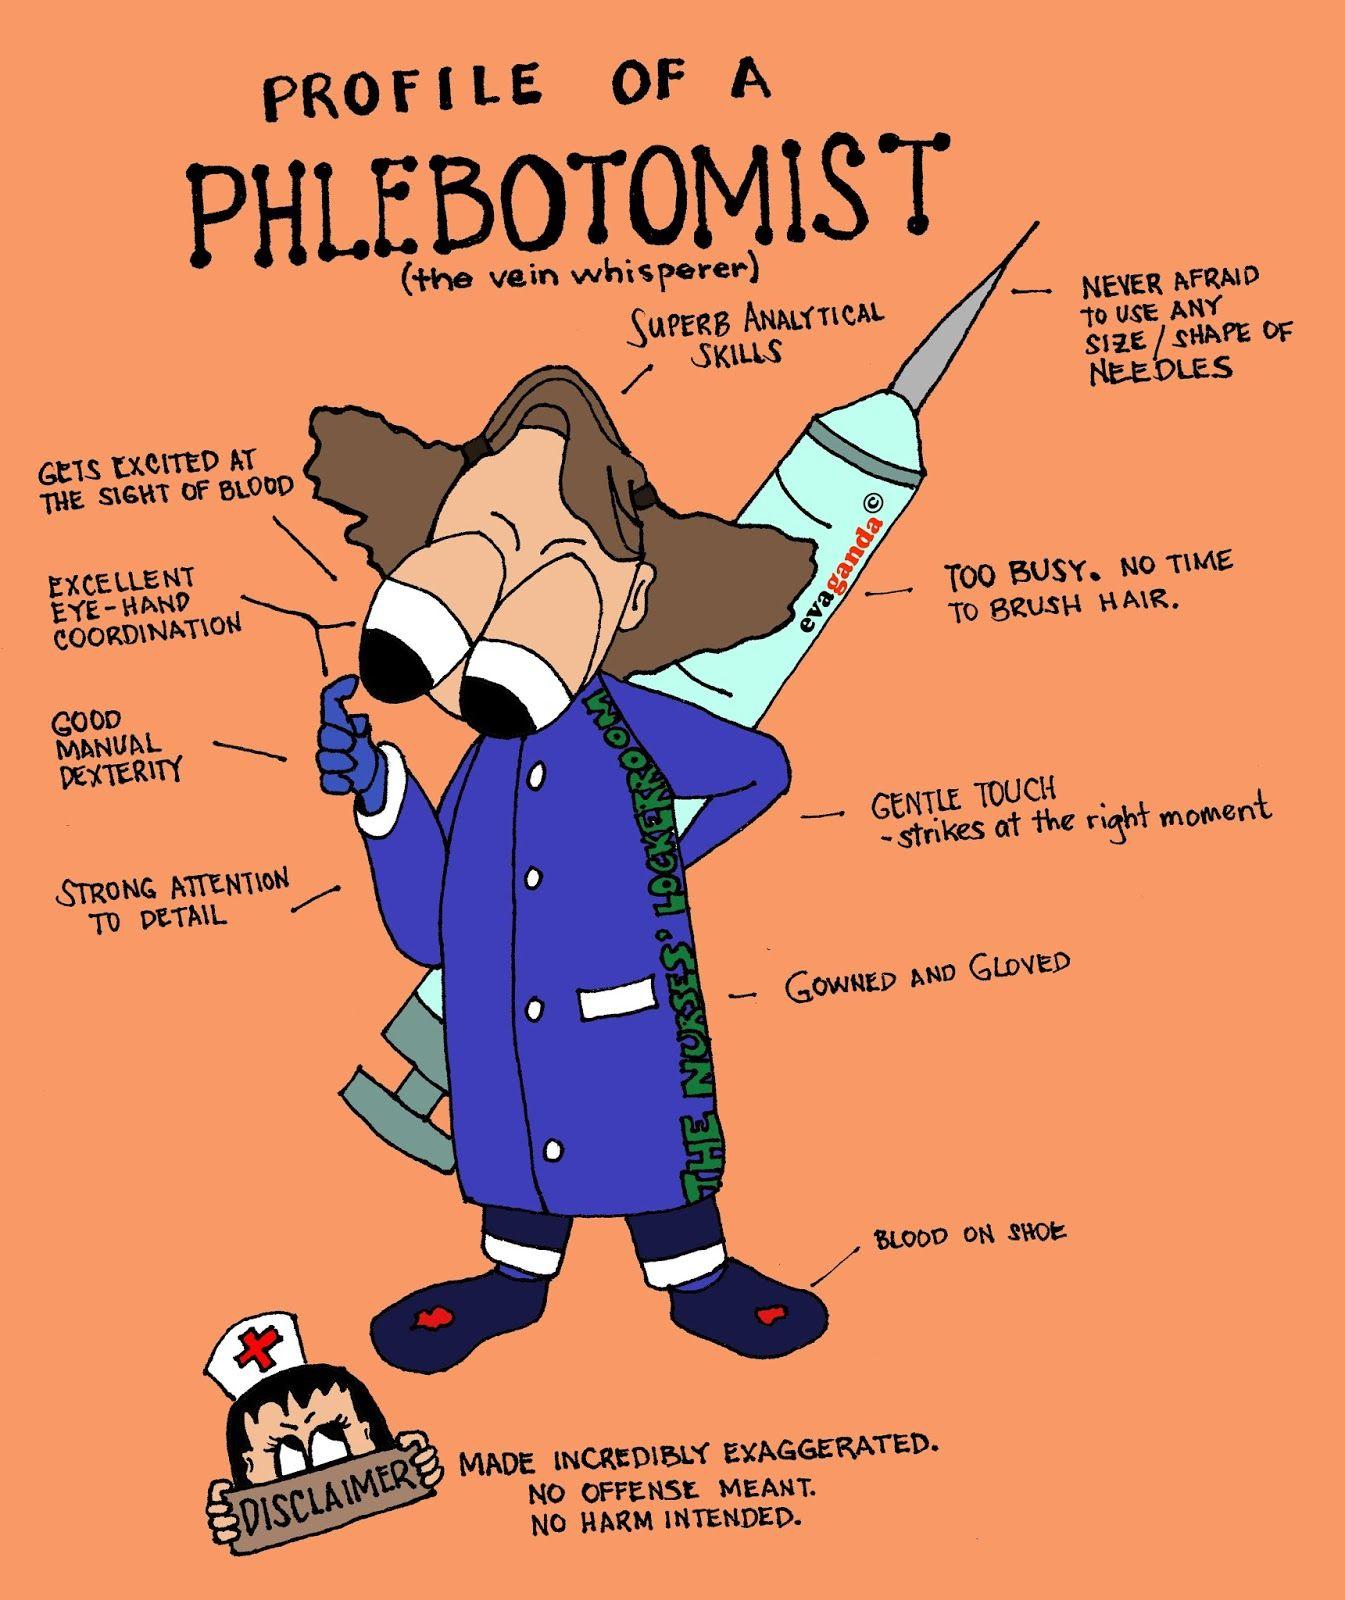 Pin by Wayne Winkler Sr. on Medical Humor if you Laugh